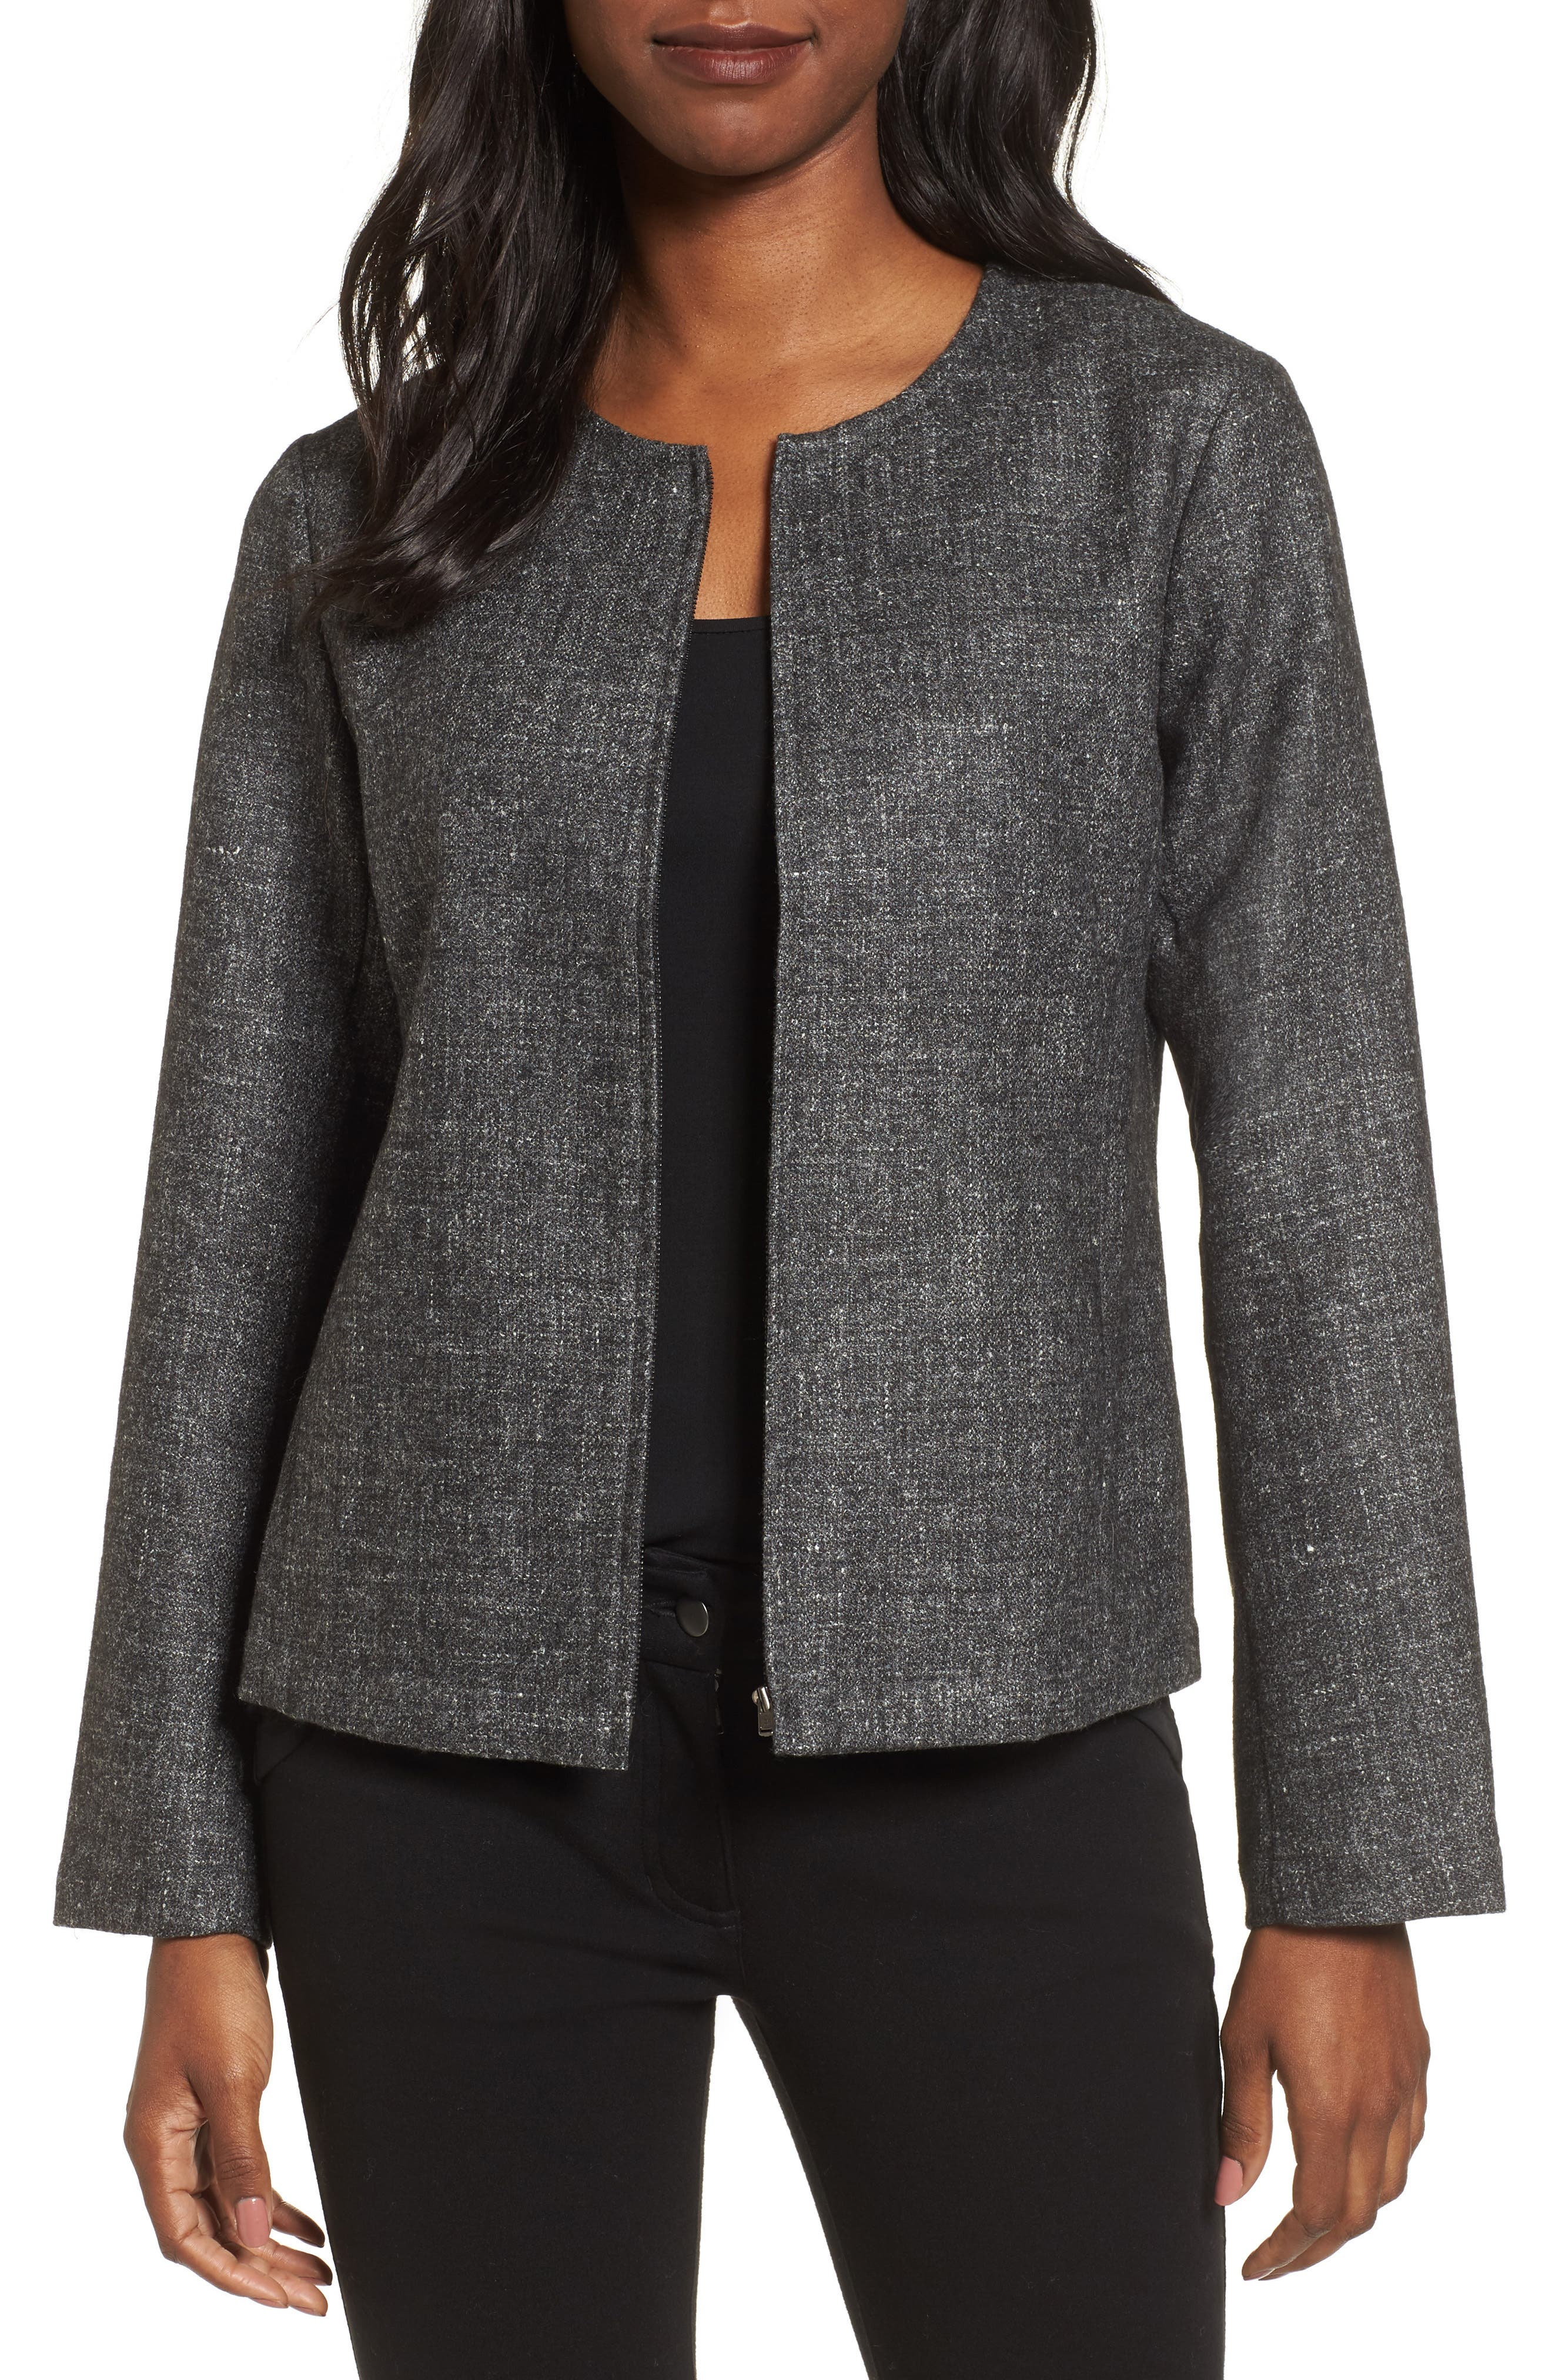 Alternate Image 1 Selected - Eileen Fisher Tweed Jacket (Nordstrom Exclusive)